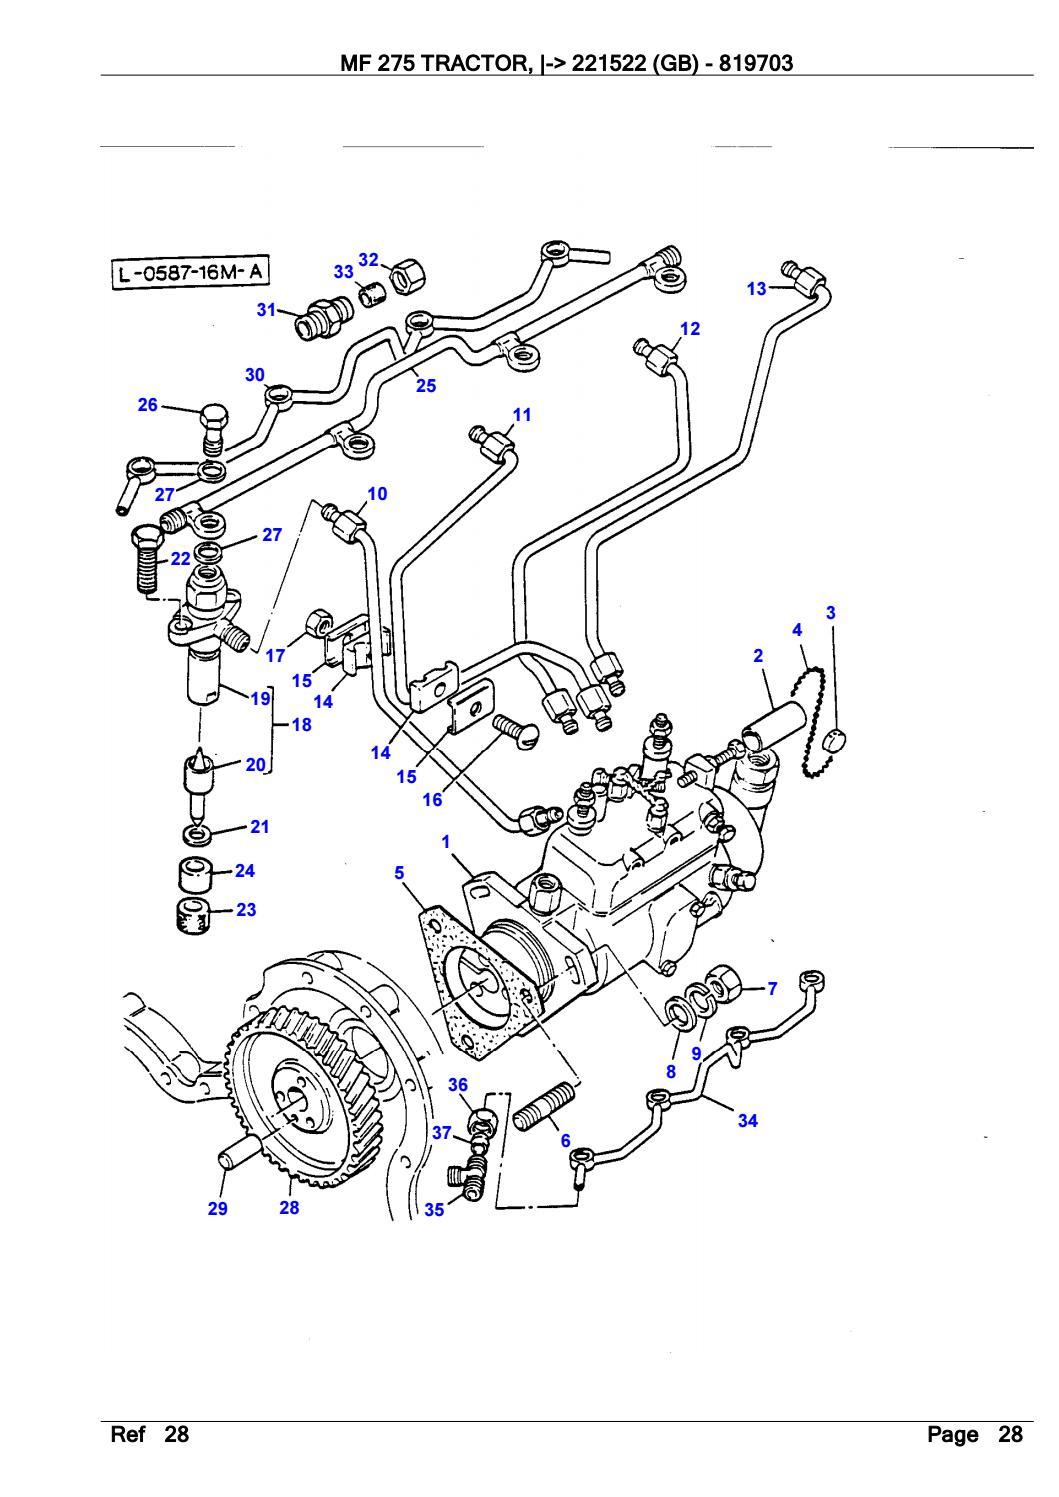 Massey Ferguson MF 275 TRACTOR (- 221522 (GB)) Parts